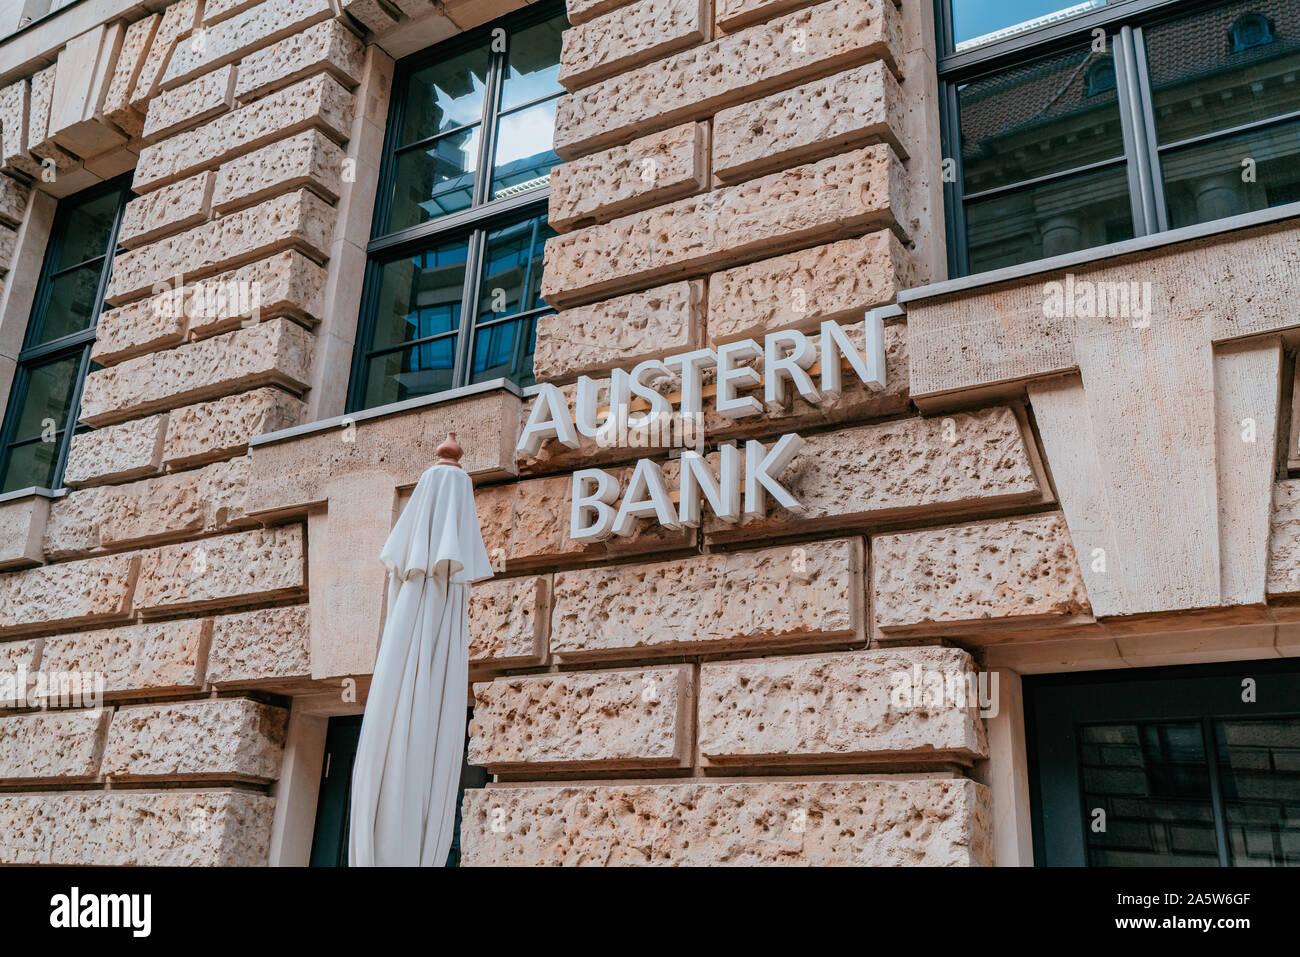 Berlin, Germany - September 20, 2019: Austernbank, Company Sign in Central Berlin Stock Photo